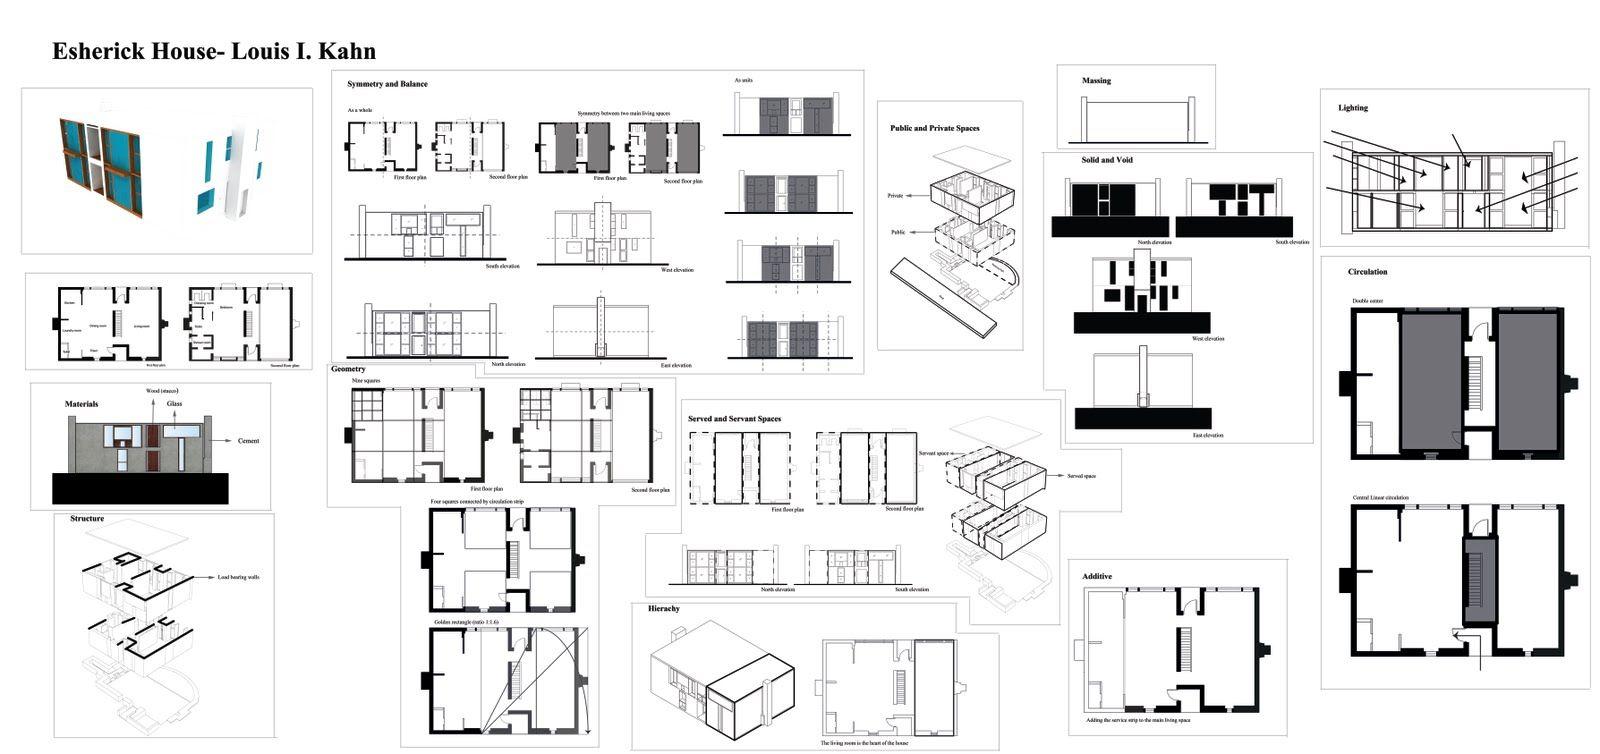 Pin by mayisha tasnim moury on project | Pinterest | Esherick house ...